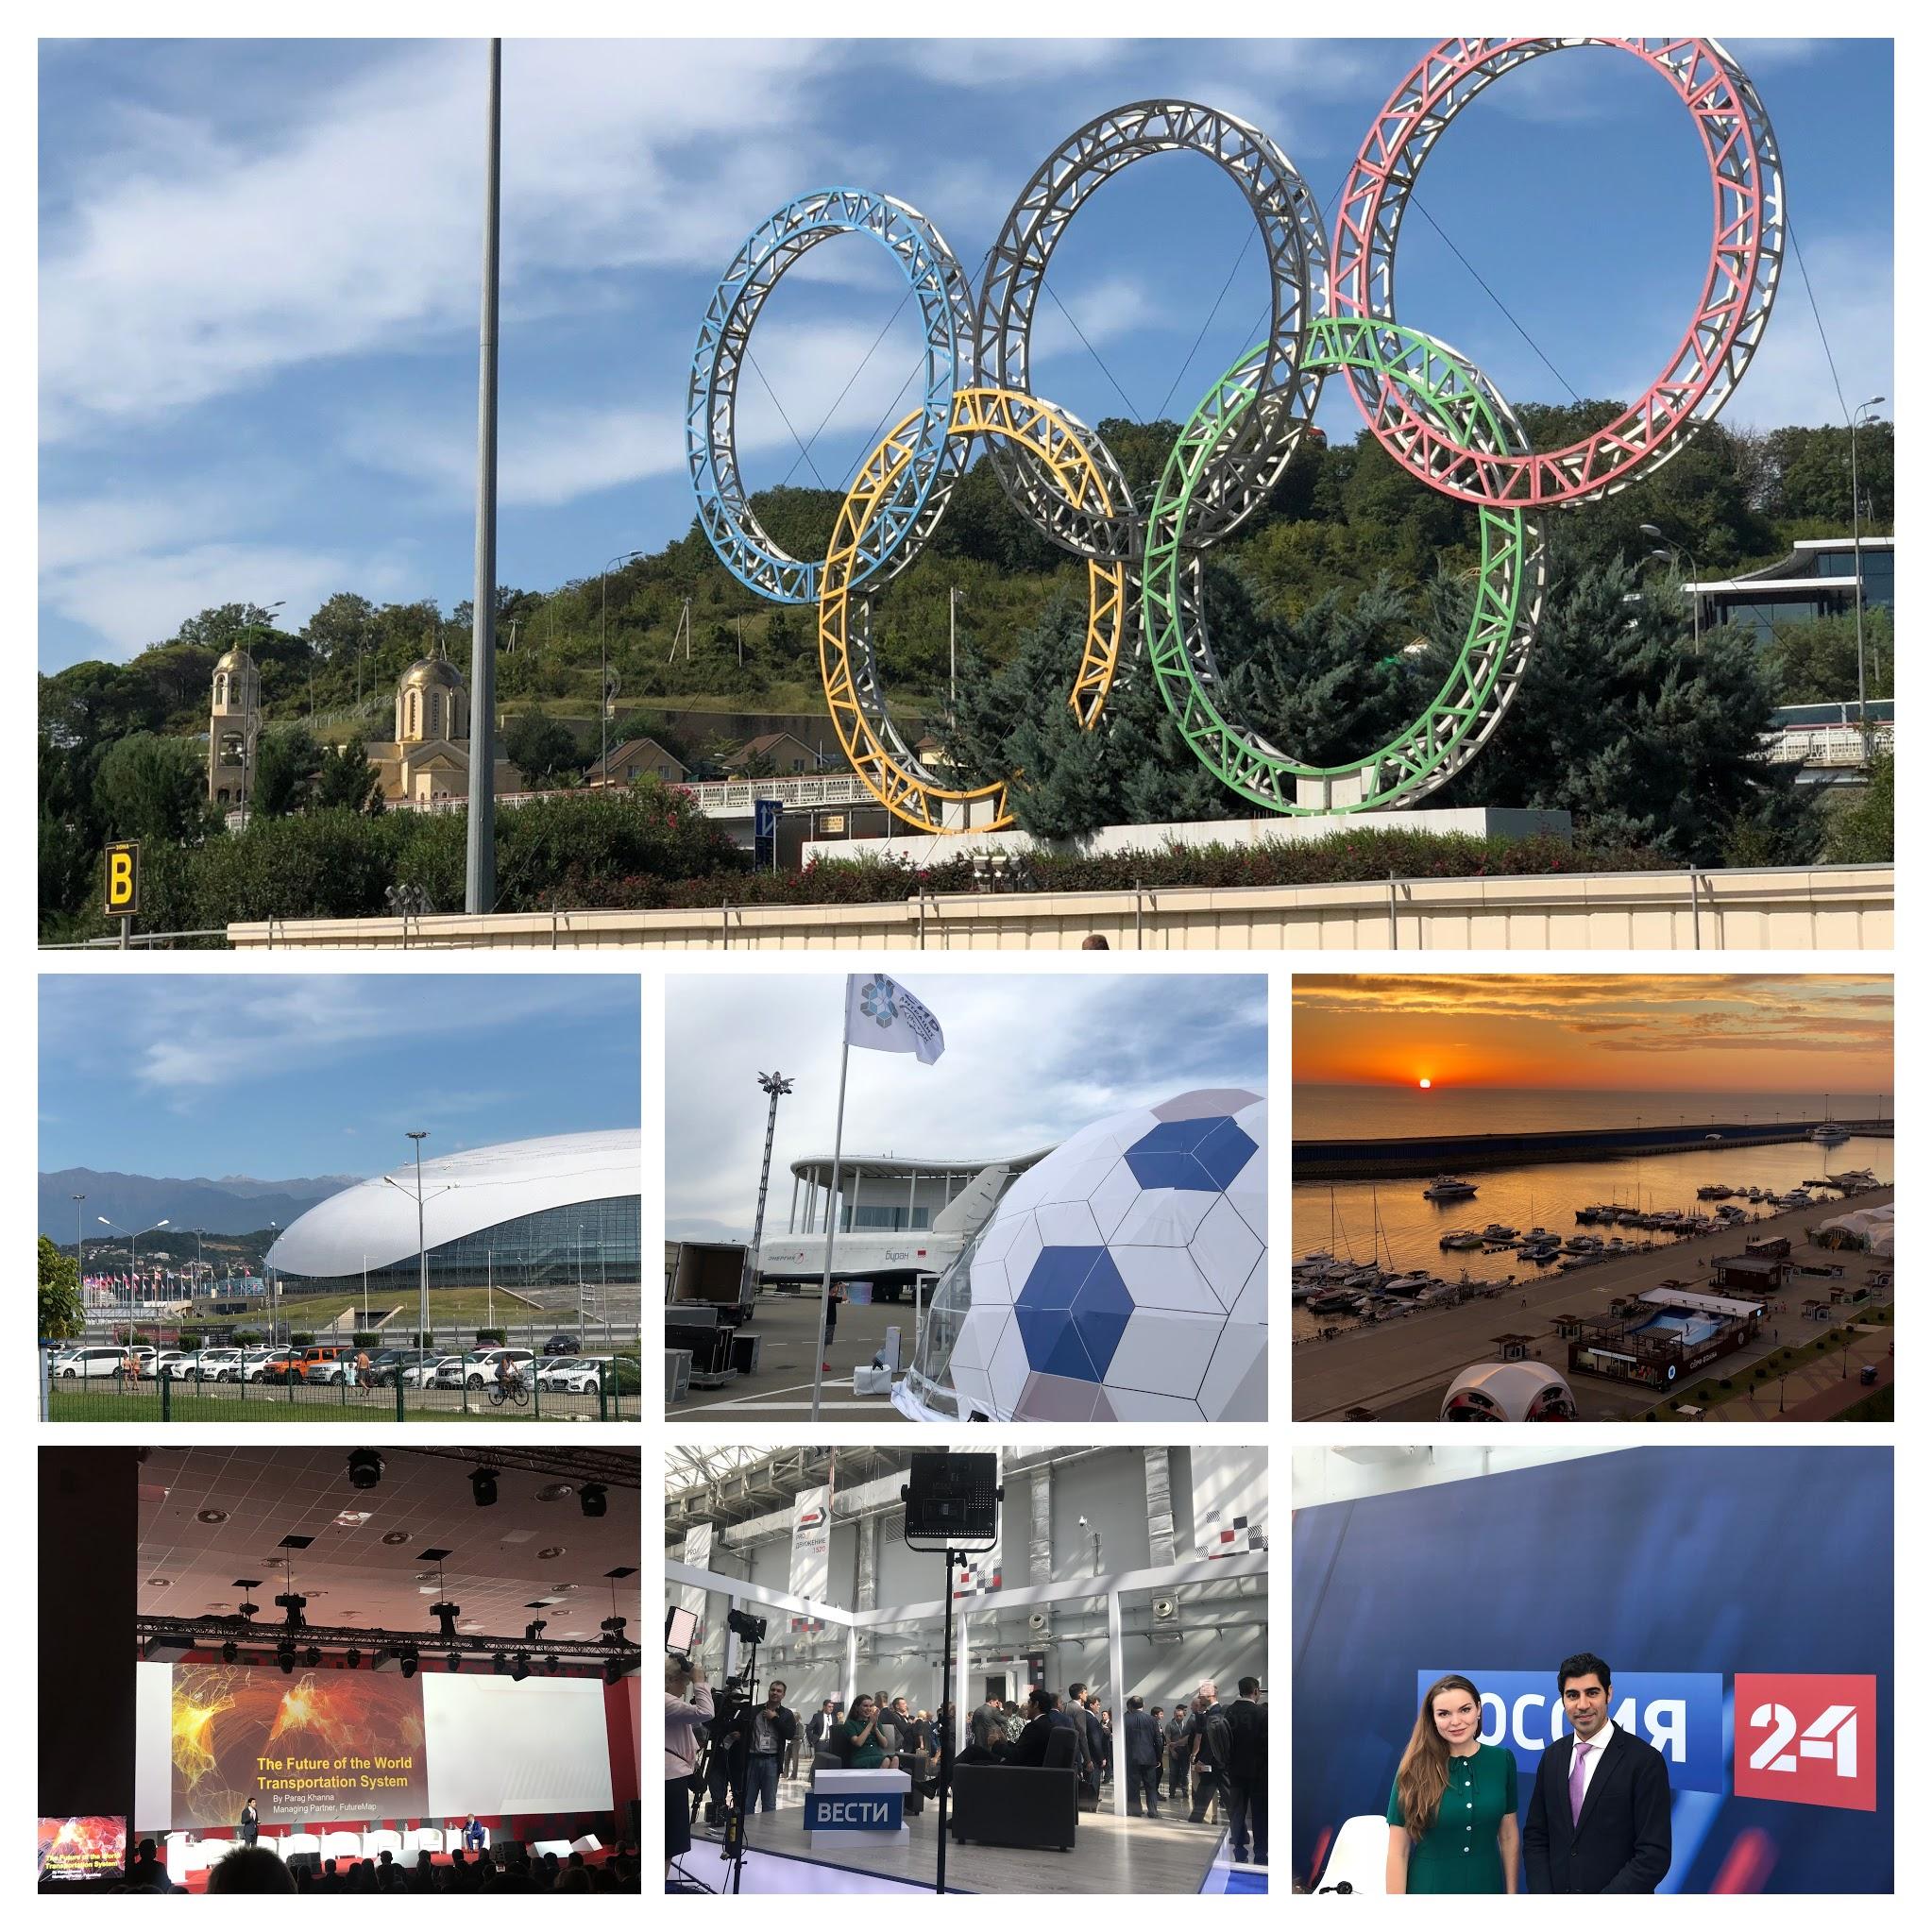 Sochi collage.jpg